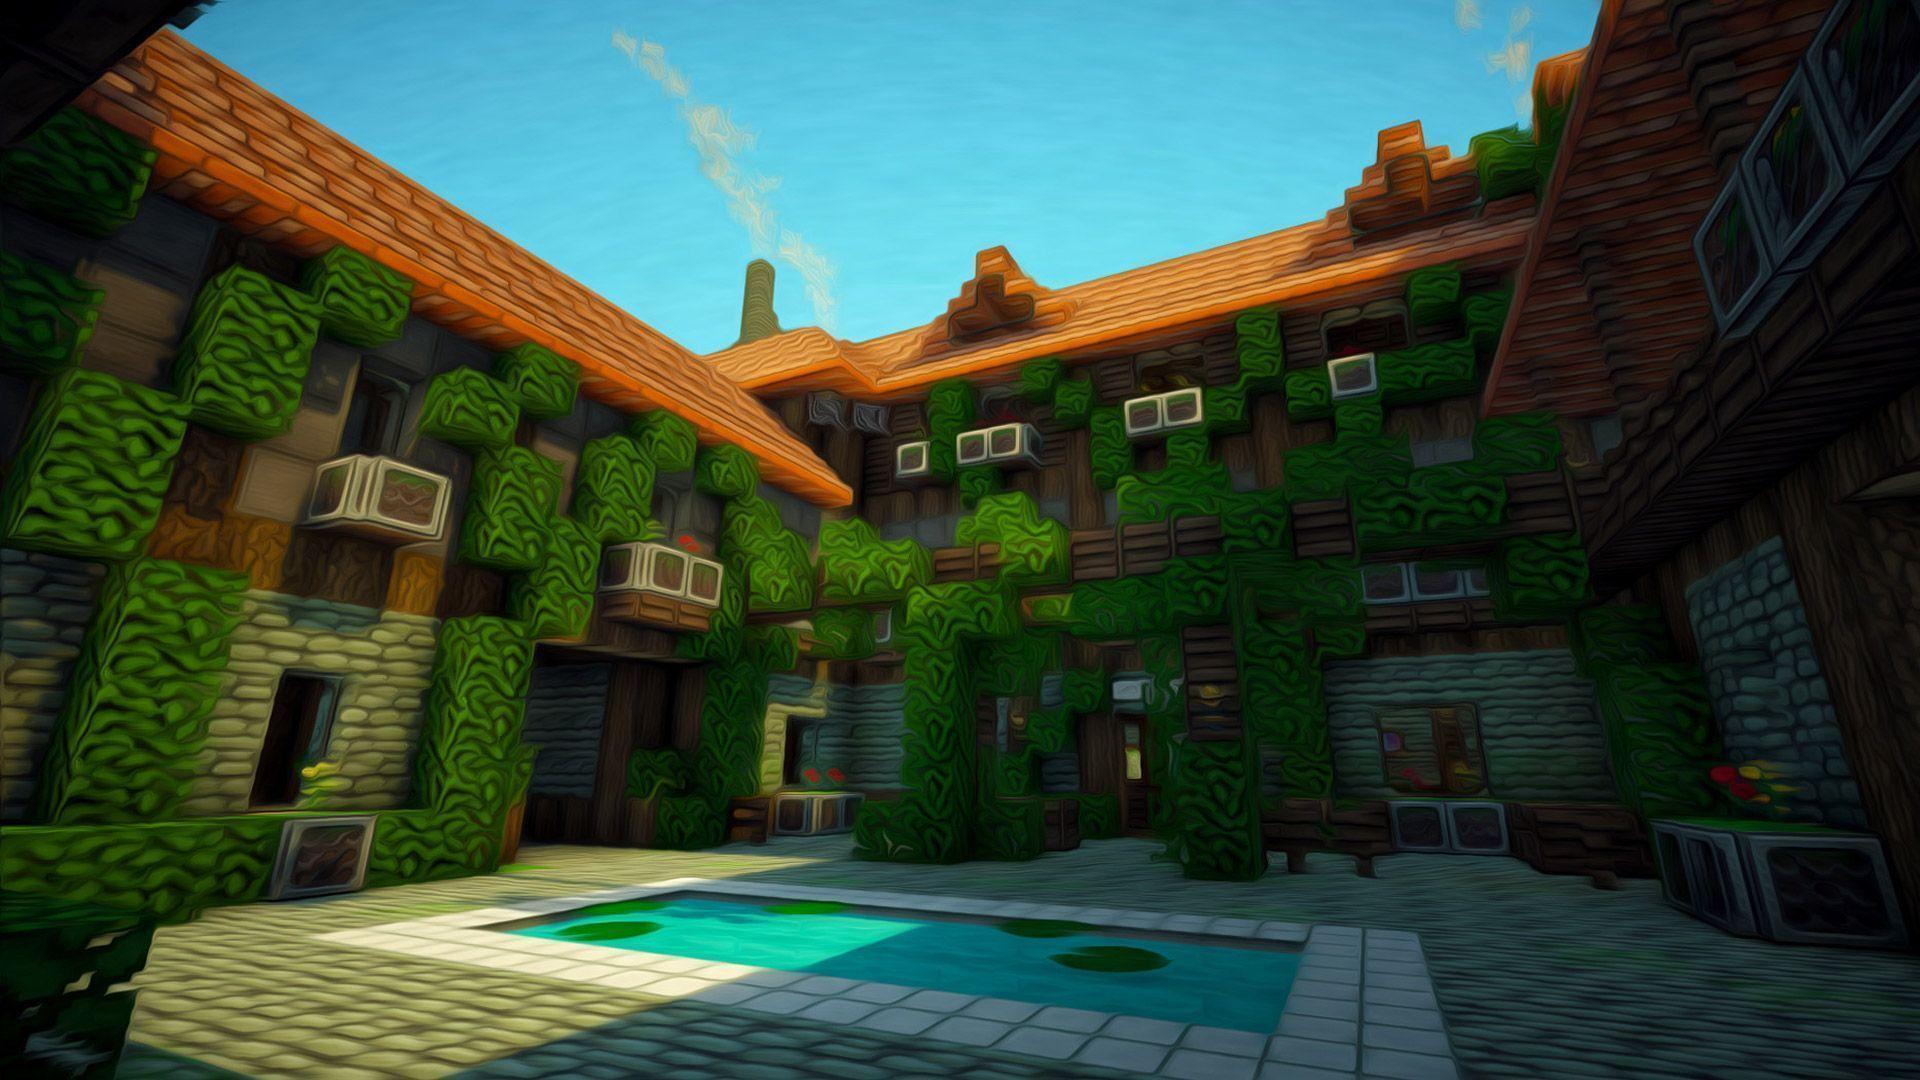 Minecraft HD Wallpapers - HD Wallpapers Inn